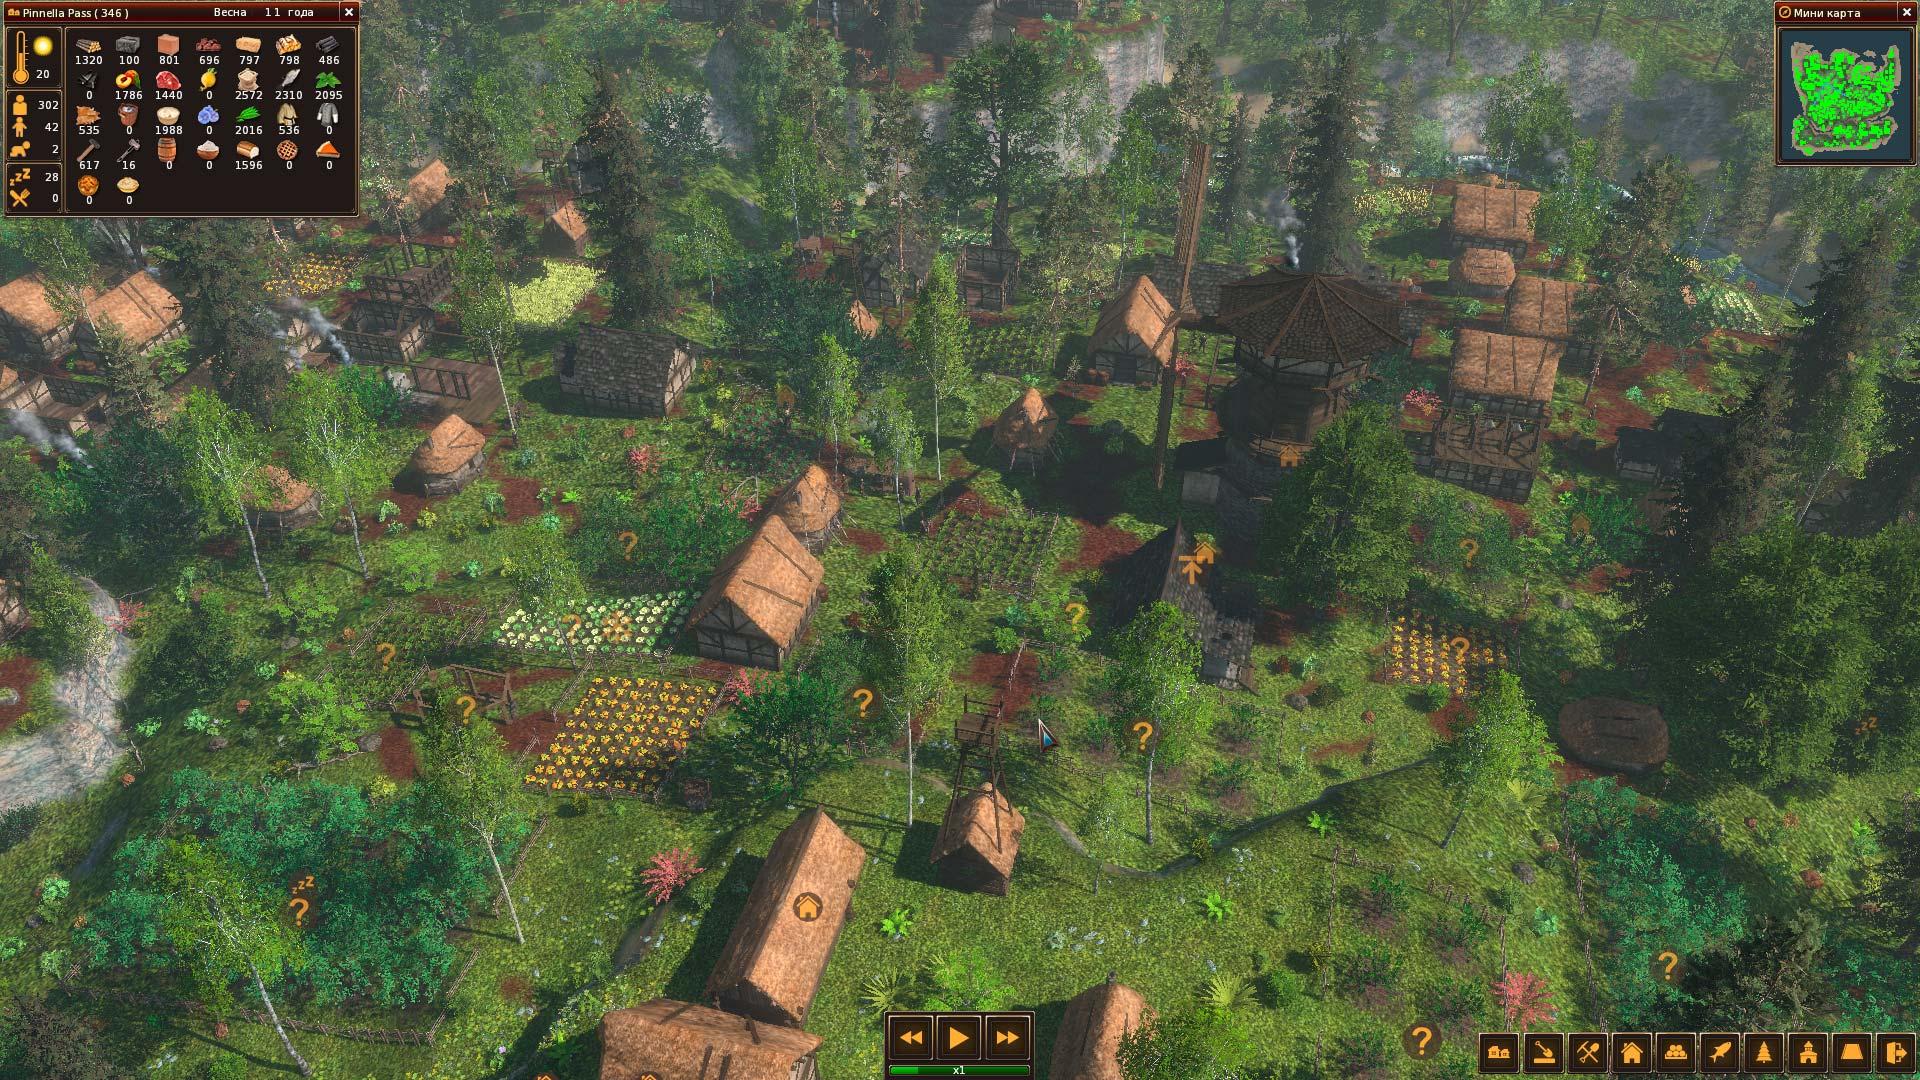 Life is feudal дома сюжетно-ролевая игра в зоопарке